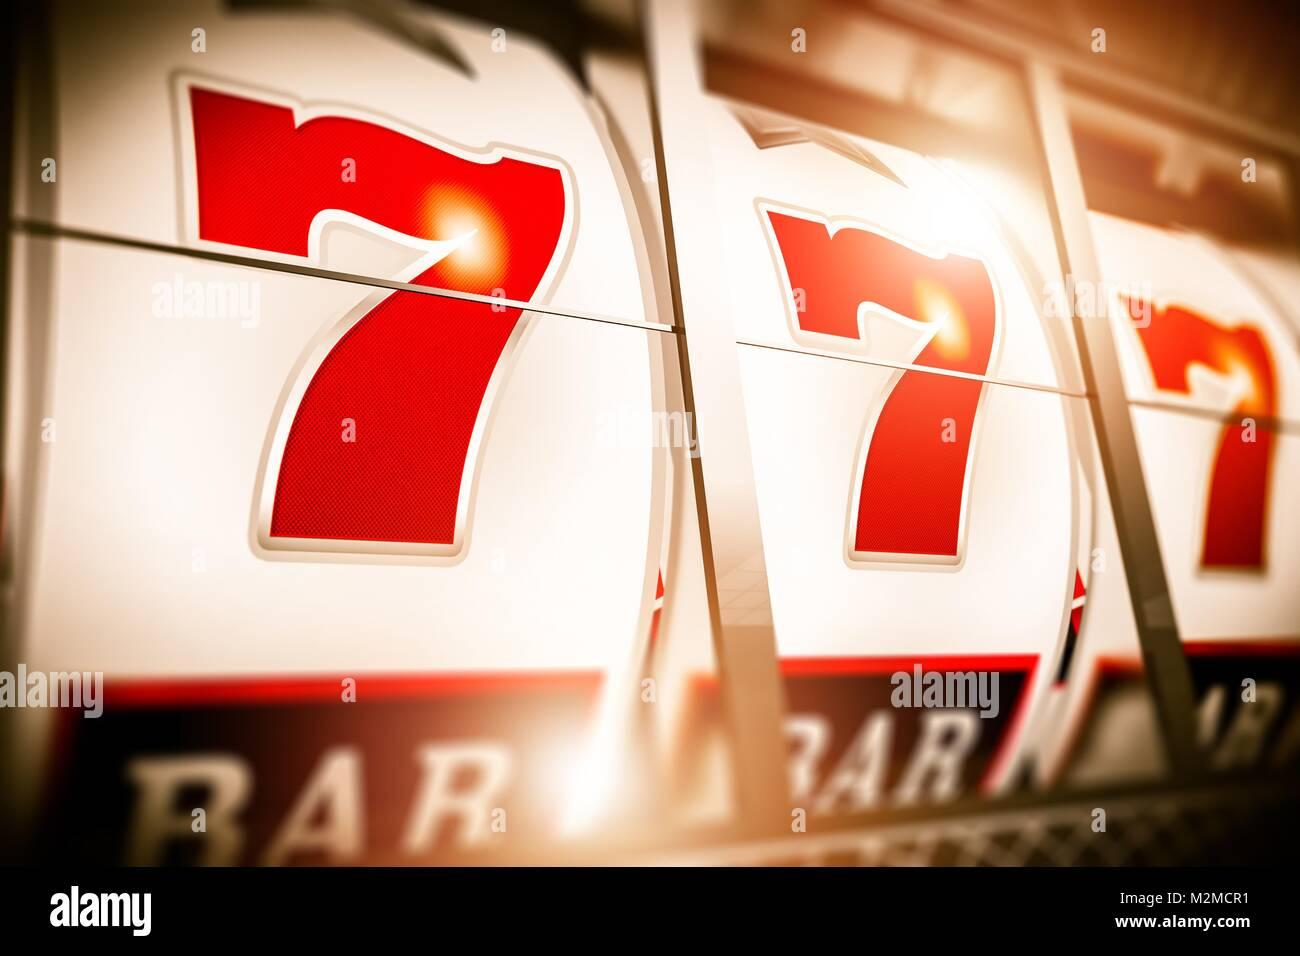 Slot Fruit Machine Closeup. Lucky Triple Seven Jackpot. 3D Rendered Illustration. - Stock Image